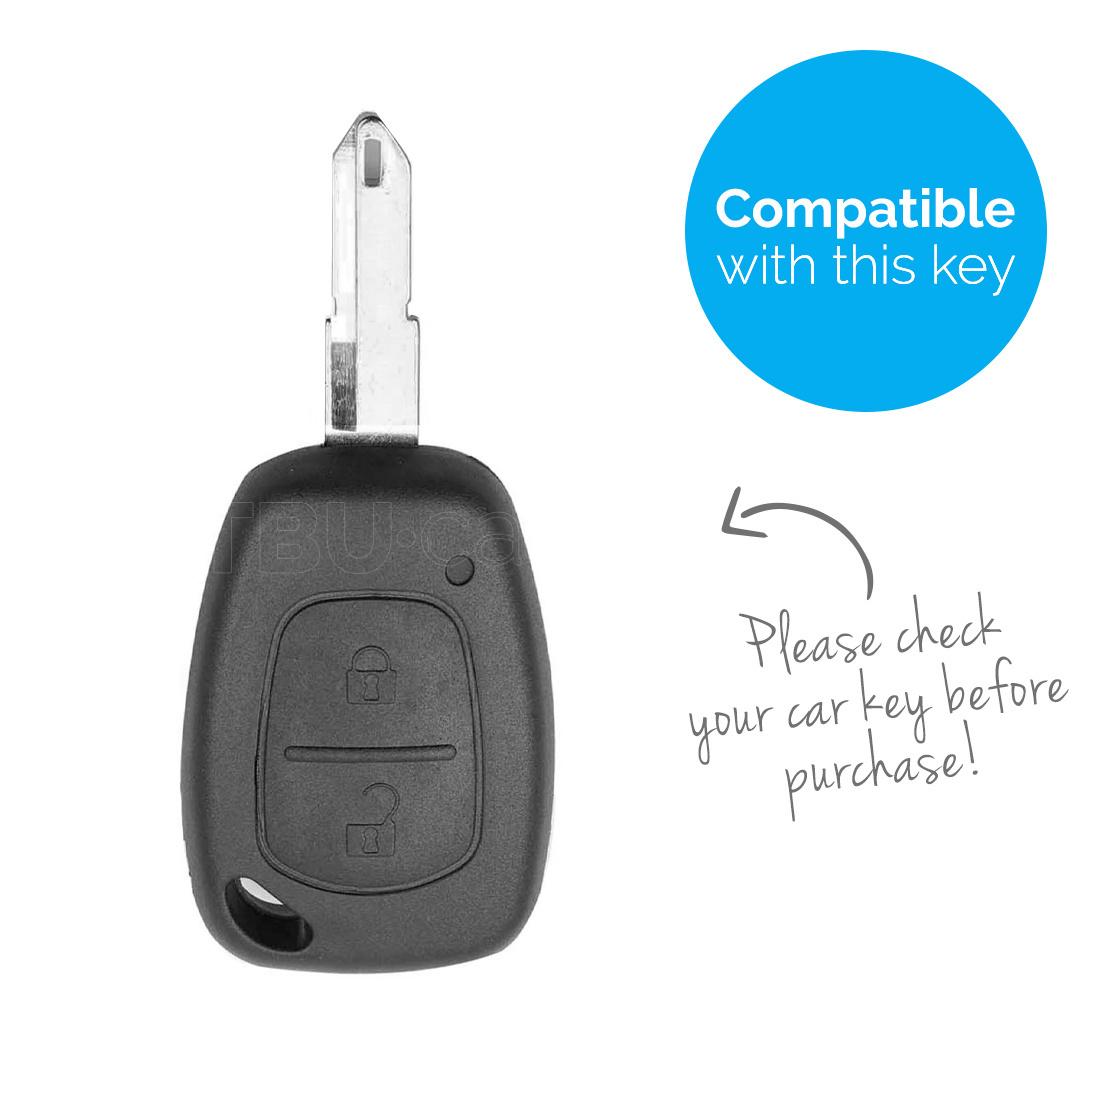 TBU car Autoschlüssel Hülle für Nissan 2 Tasten - Schutzhülle aus Silikon - Auto Schlüsselhülle Cover in Violett